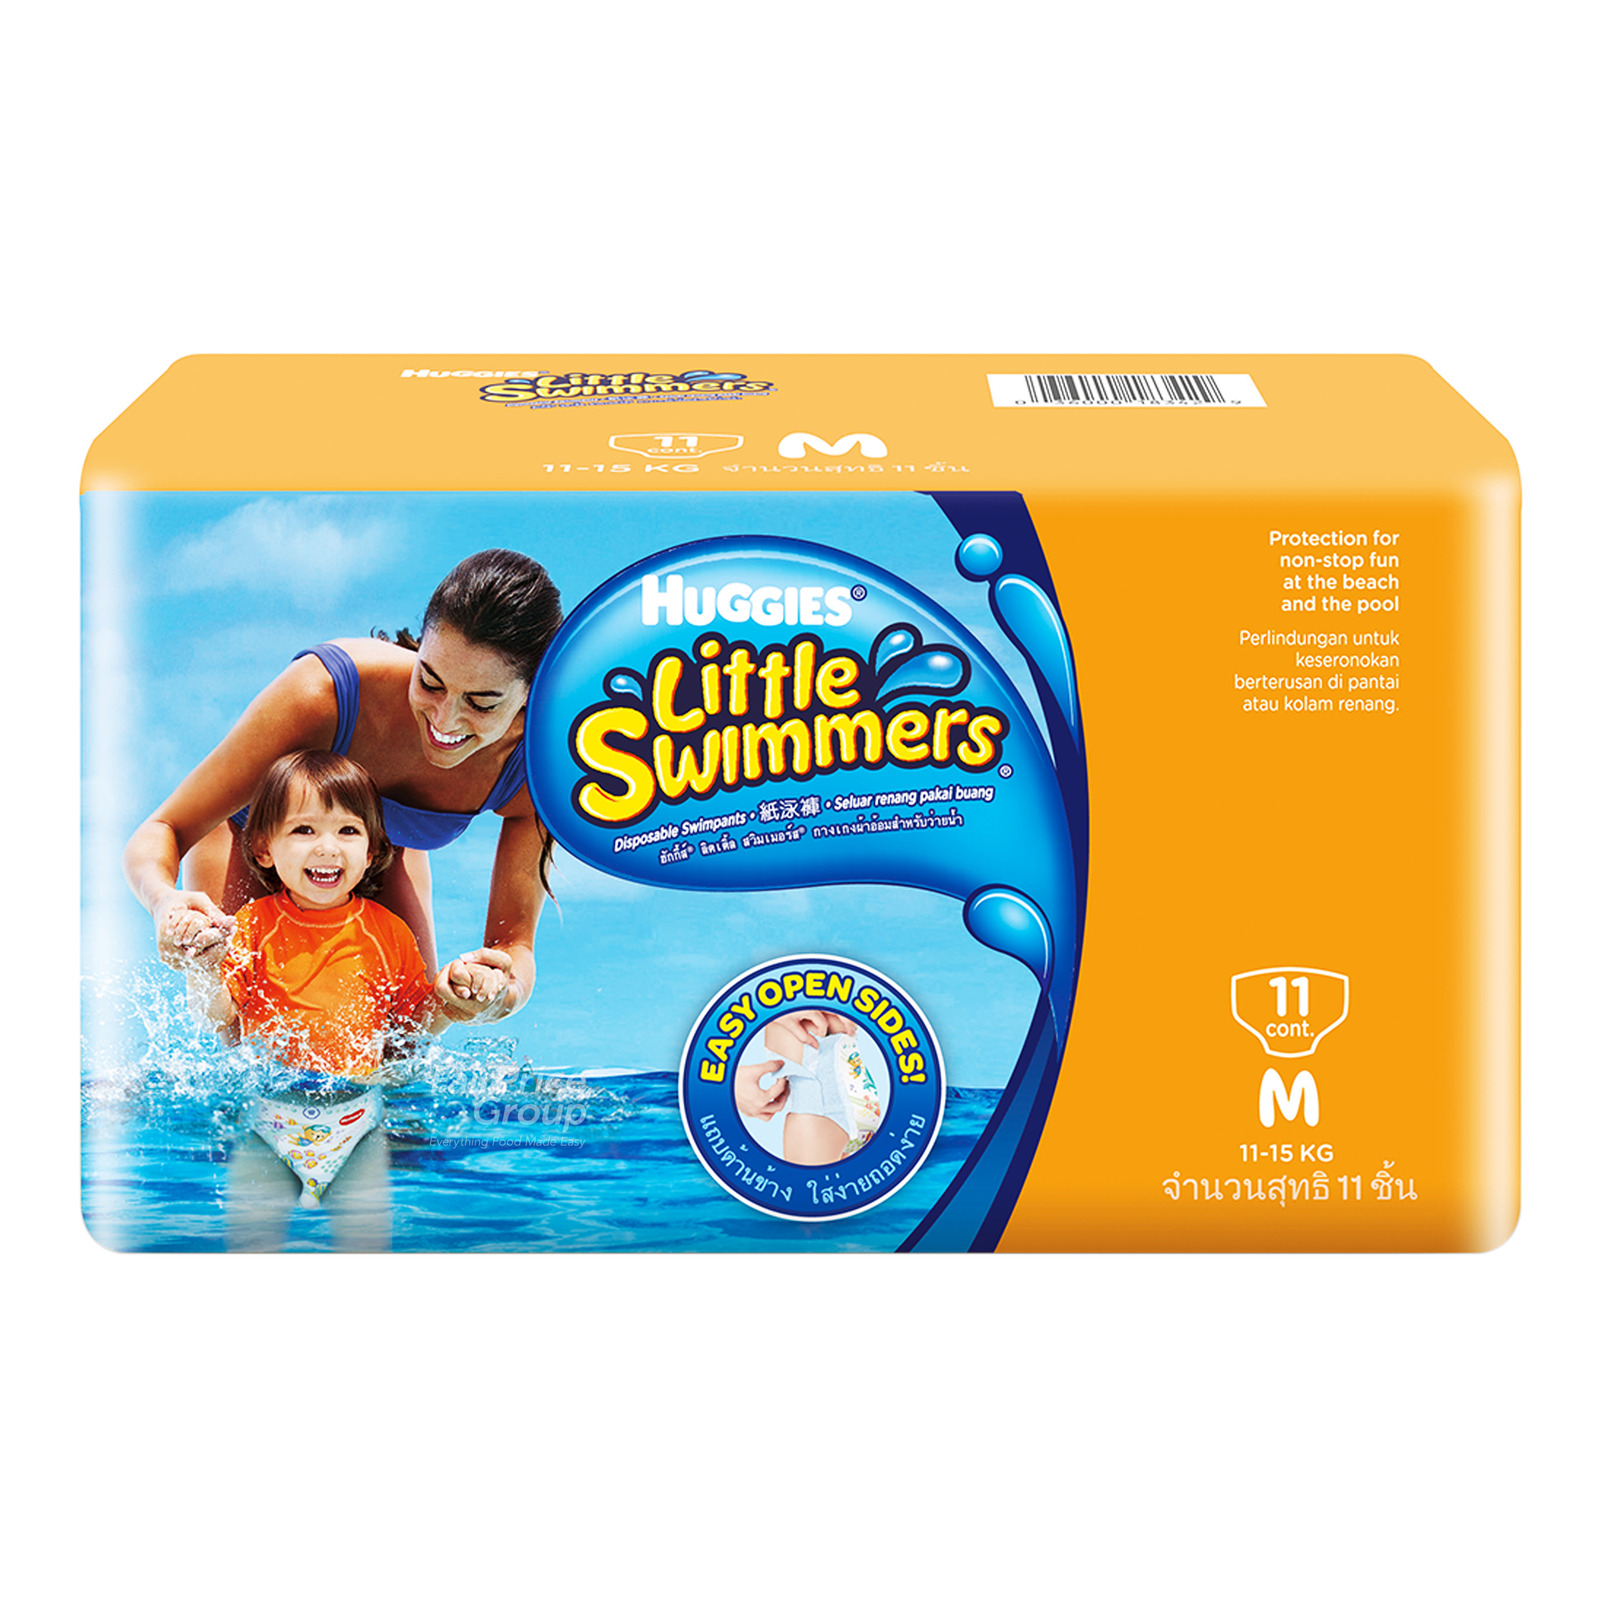 Huggies Little Swimmers Swimpants - M (11 - 15kg)